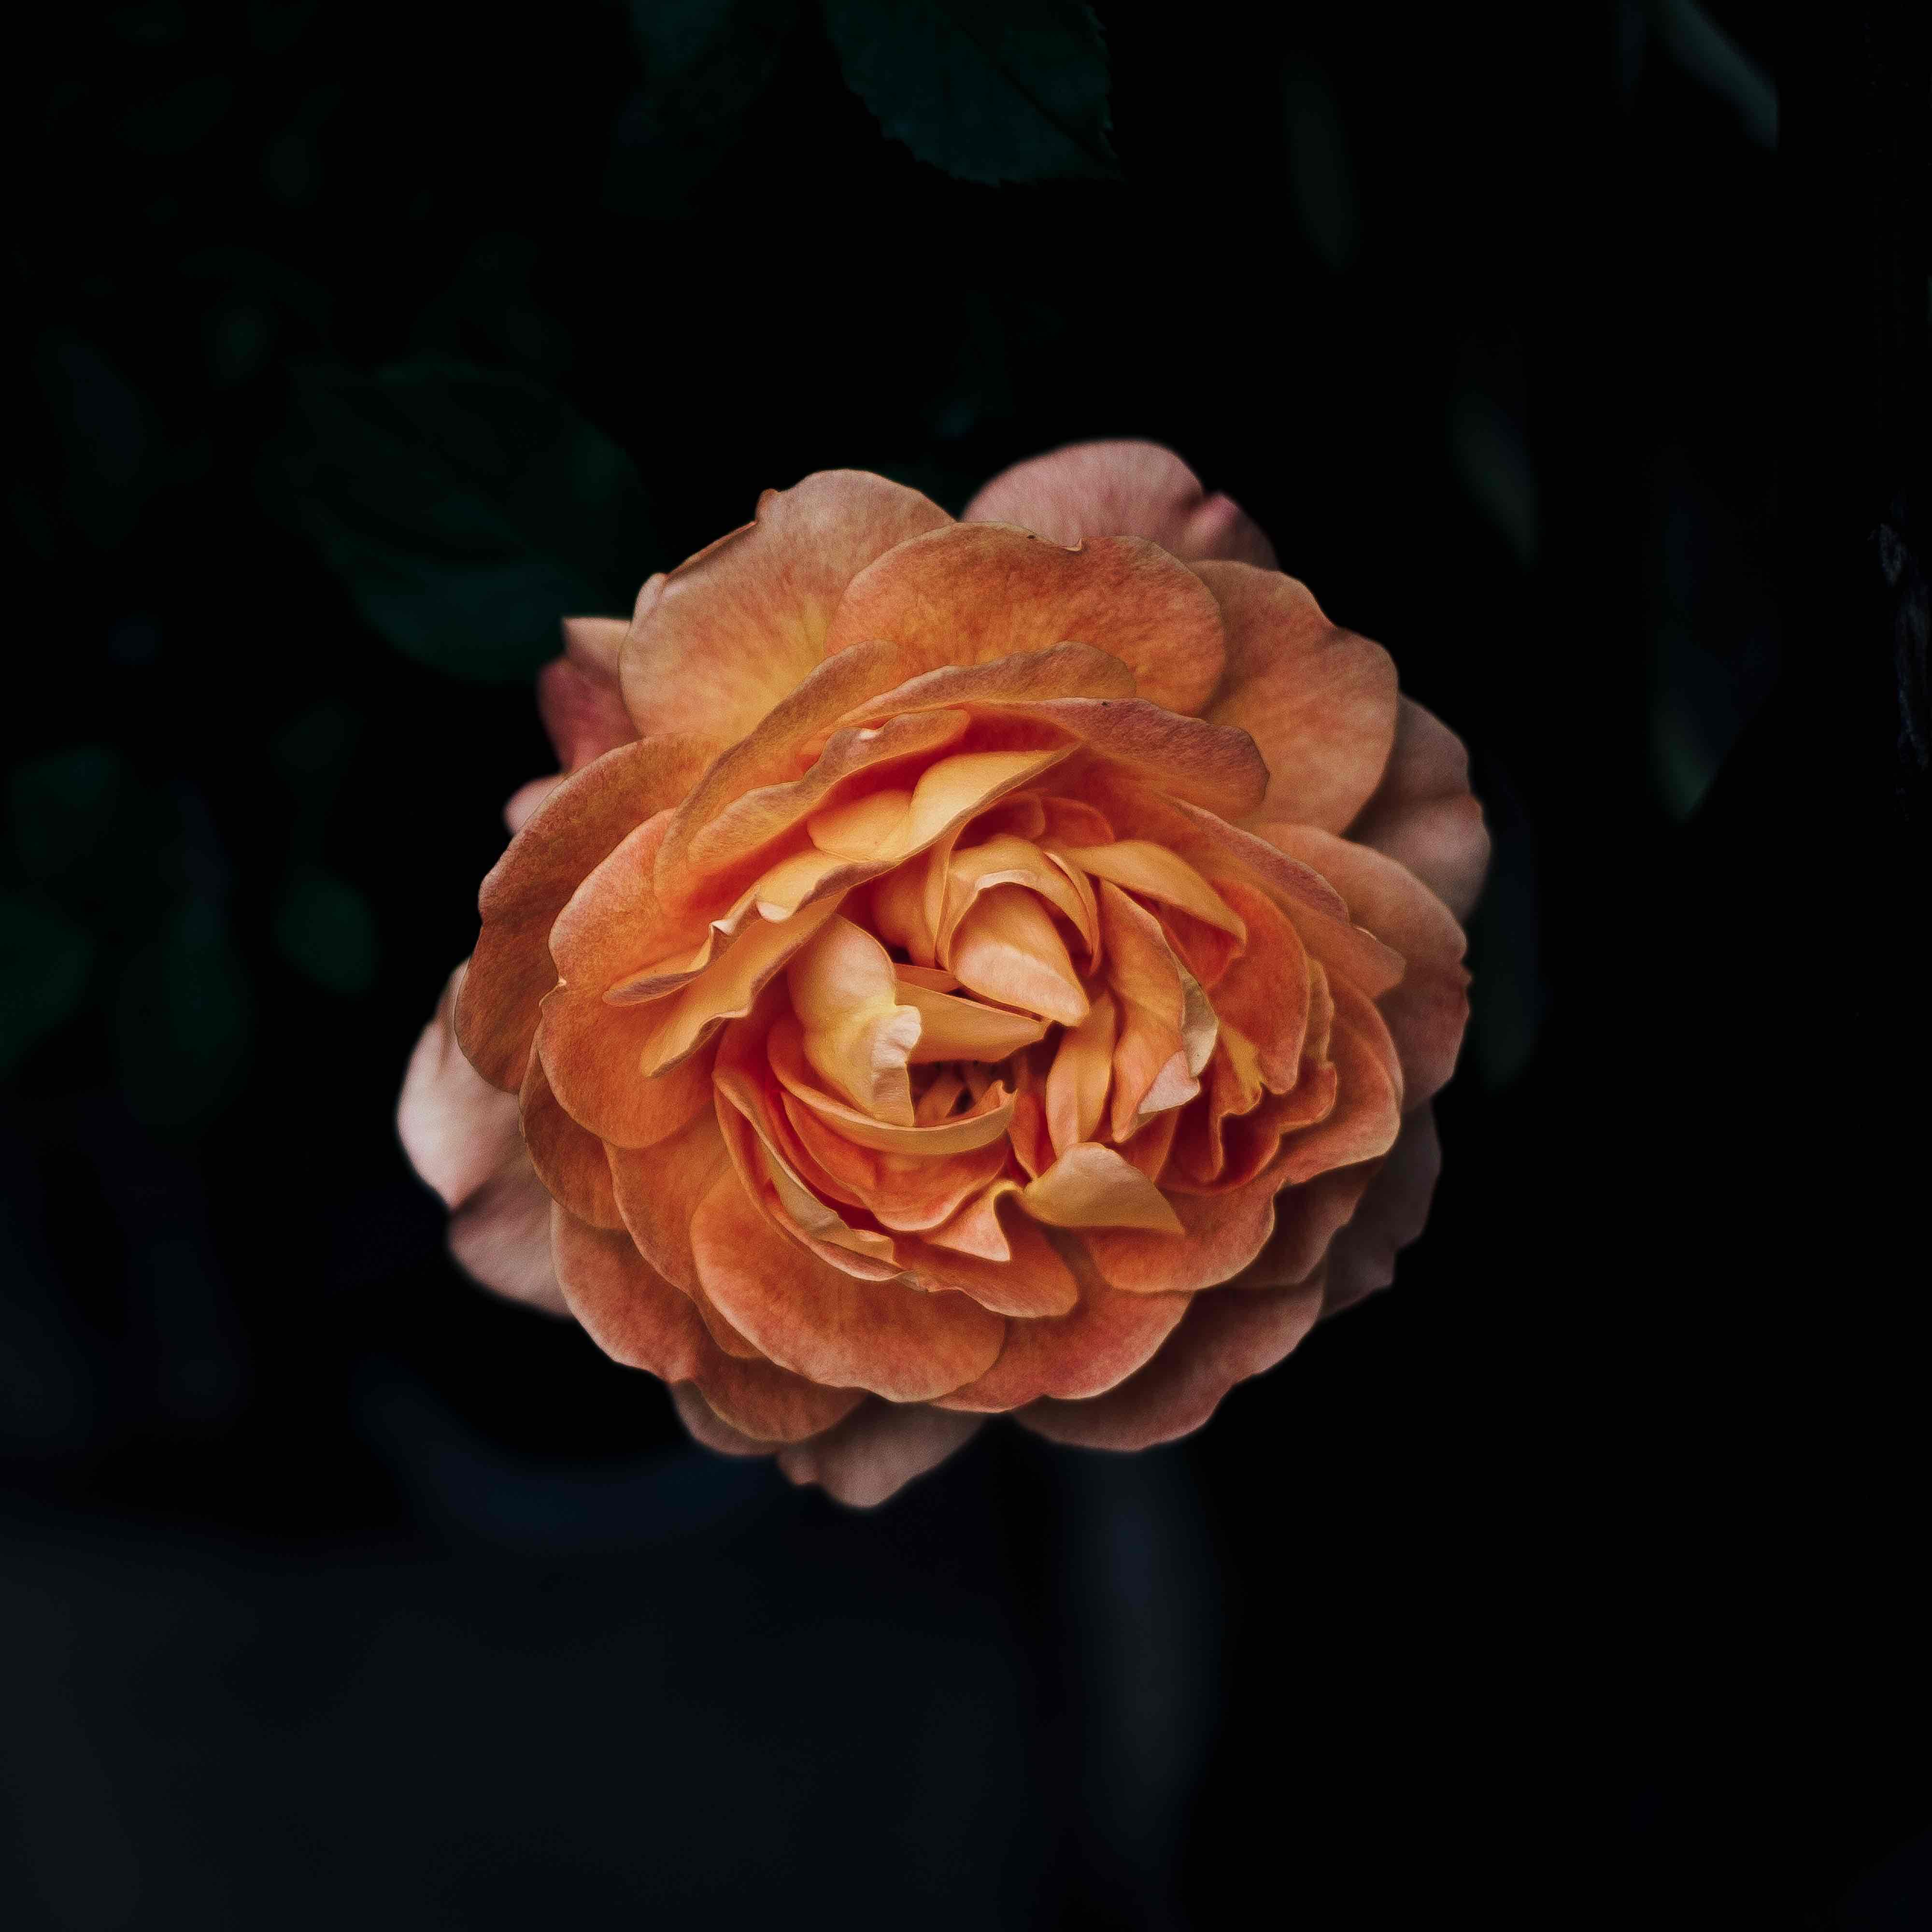 Imagenes muy lindas de flores2